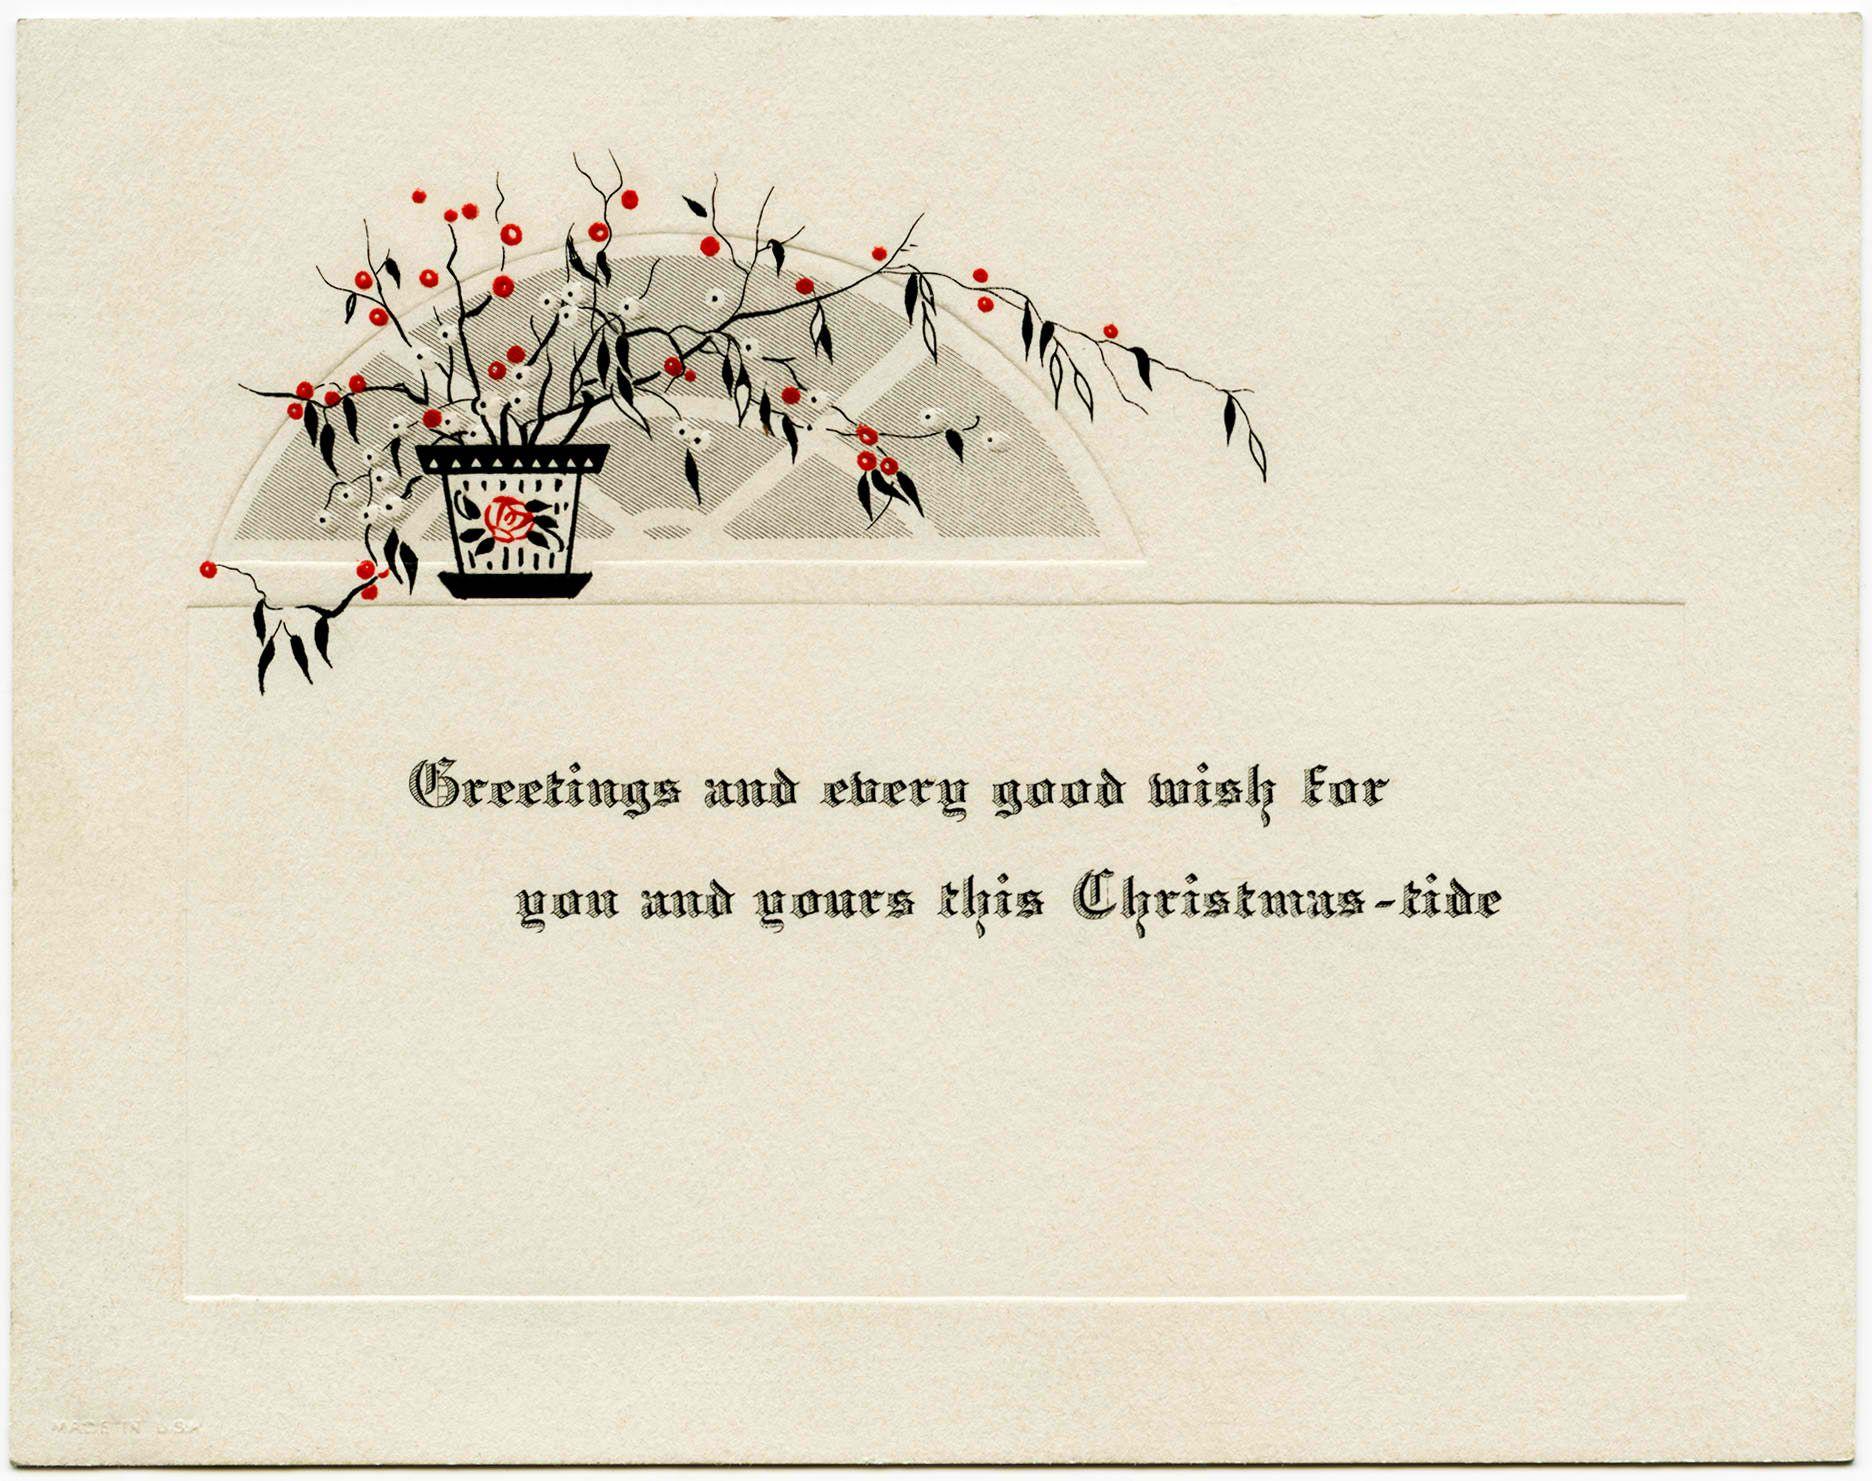 vintagefashionedchristmasgreetingcardmessage.jpg